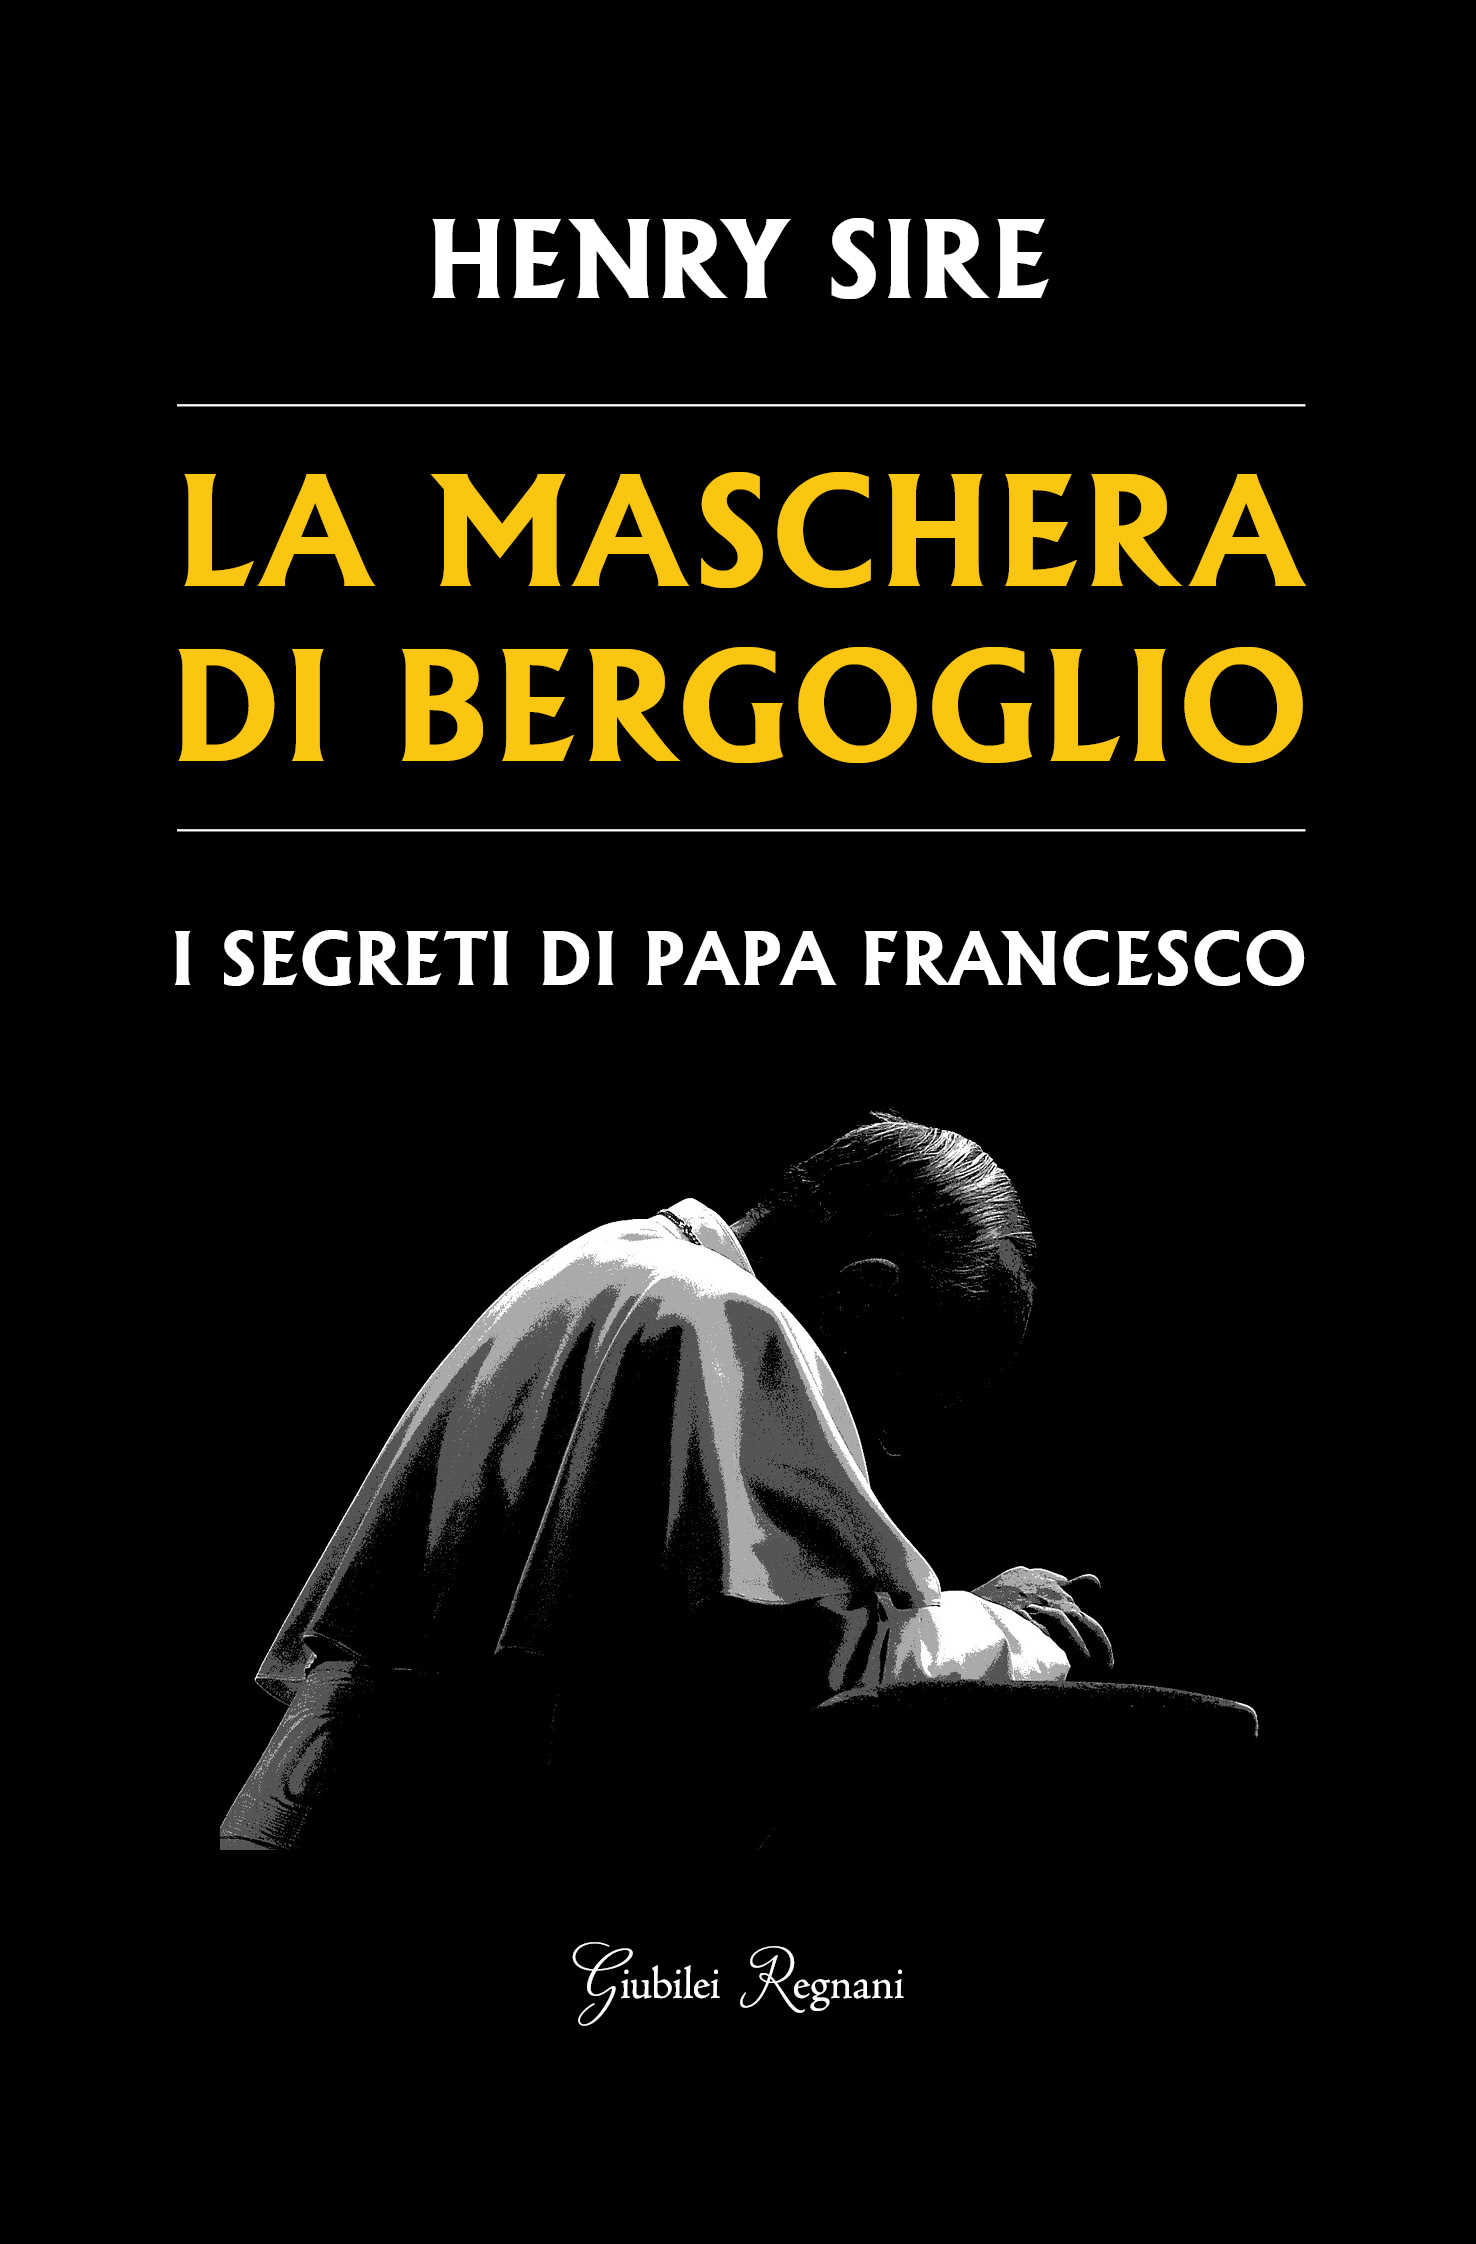 http://www.giubileiregnani.com/wp-content/uploads/2018/10/Maschera-di-Bergoglio_cover-1.jpg